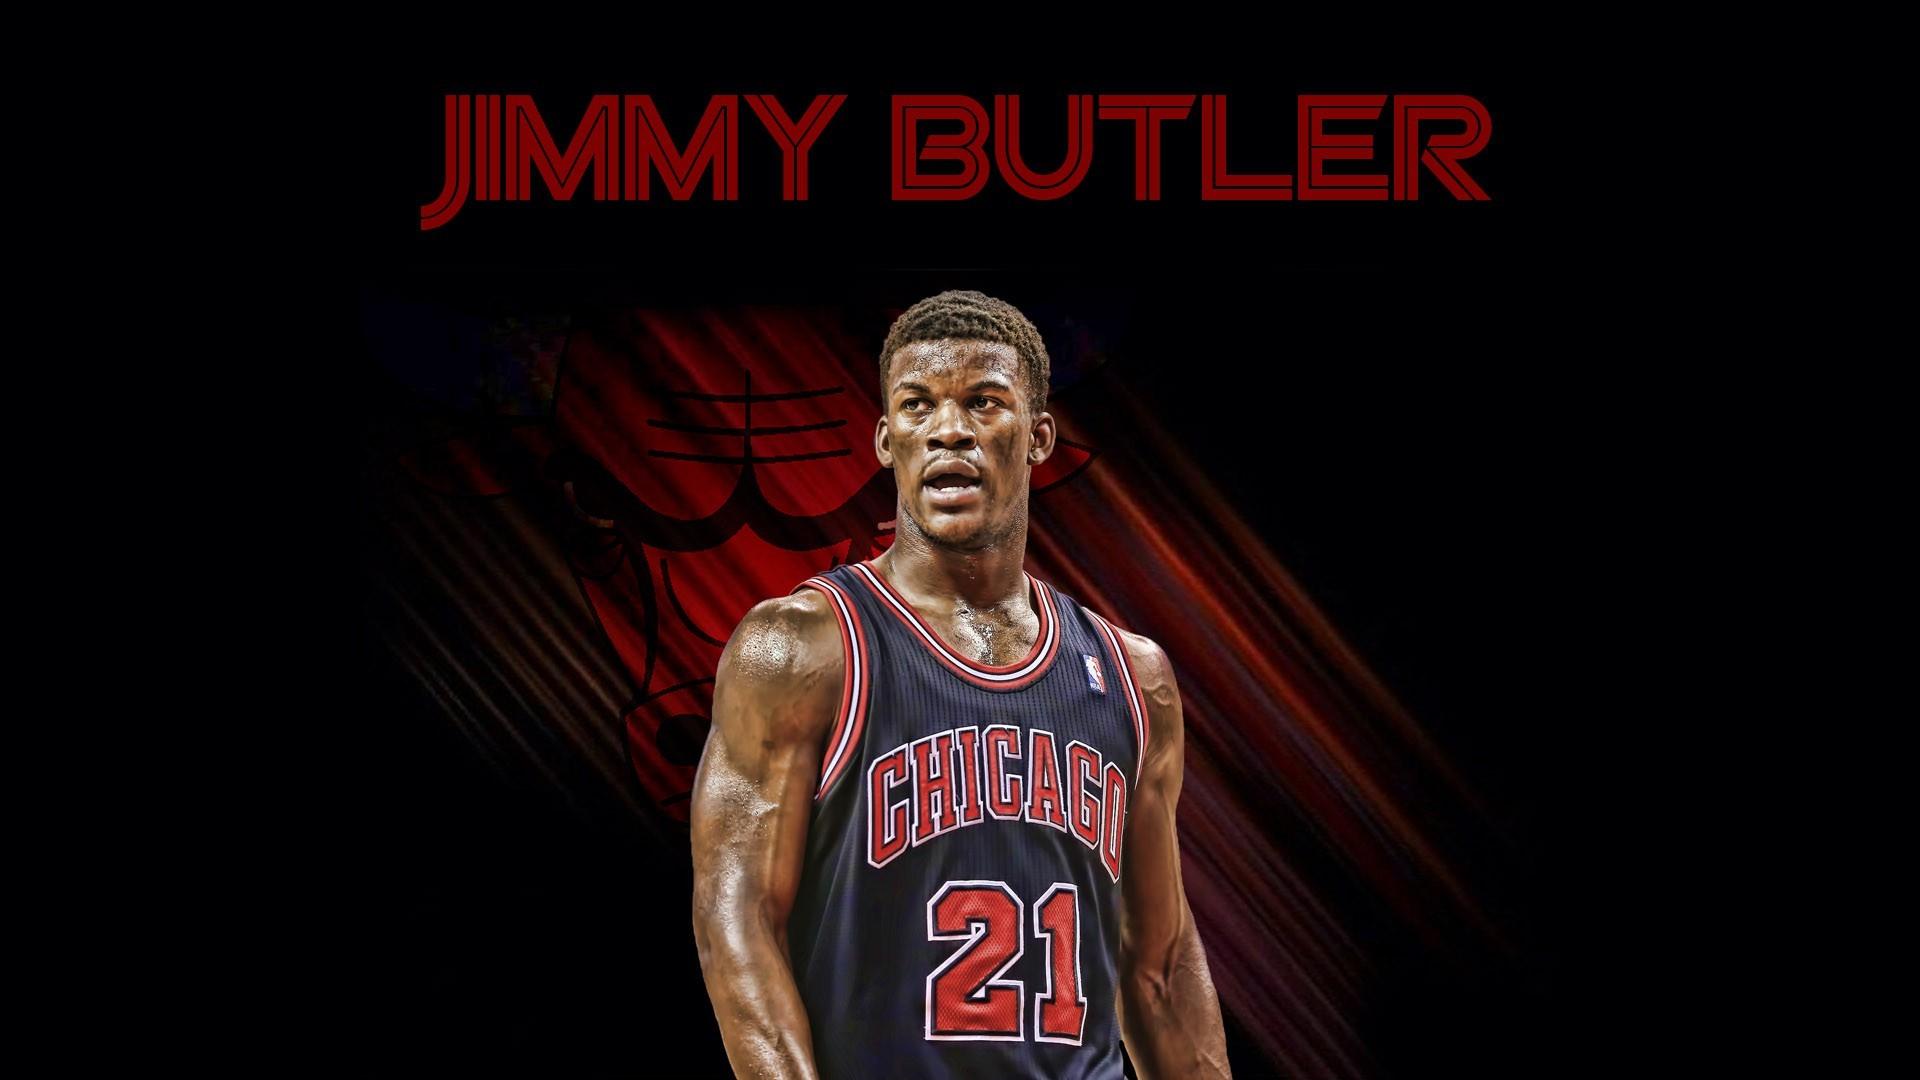 Jimmy Butler 21 Chicago Bulls 2015 Wallpaper